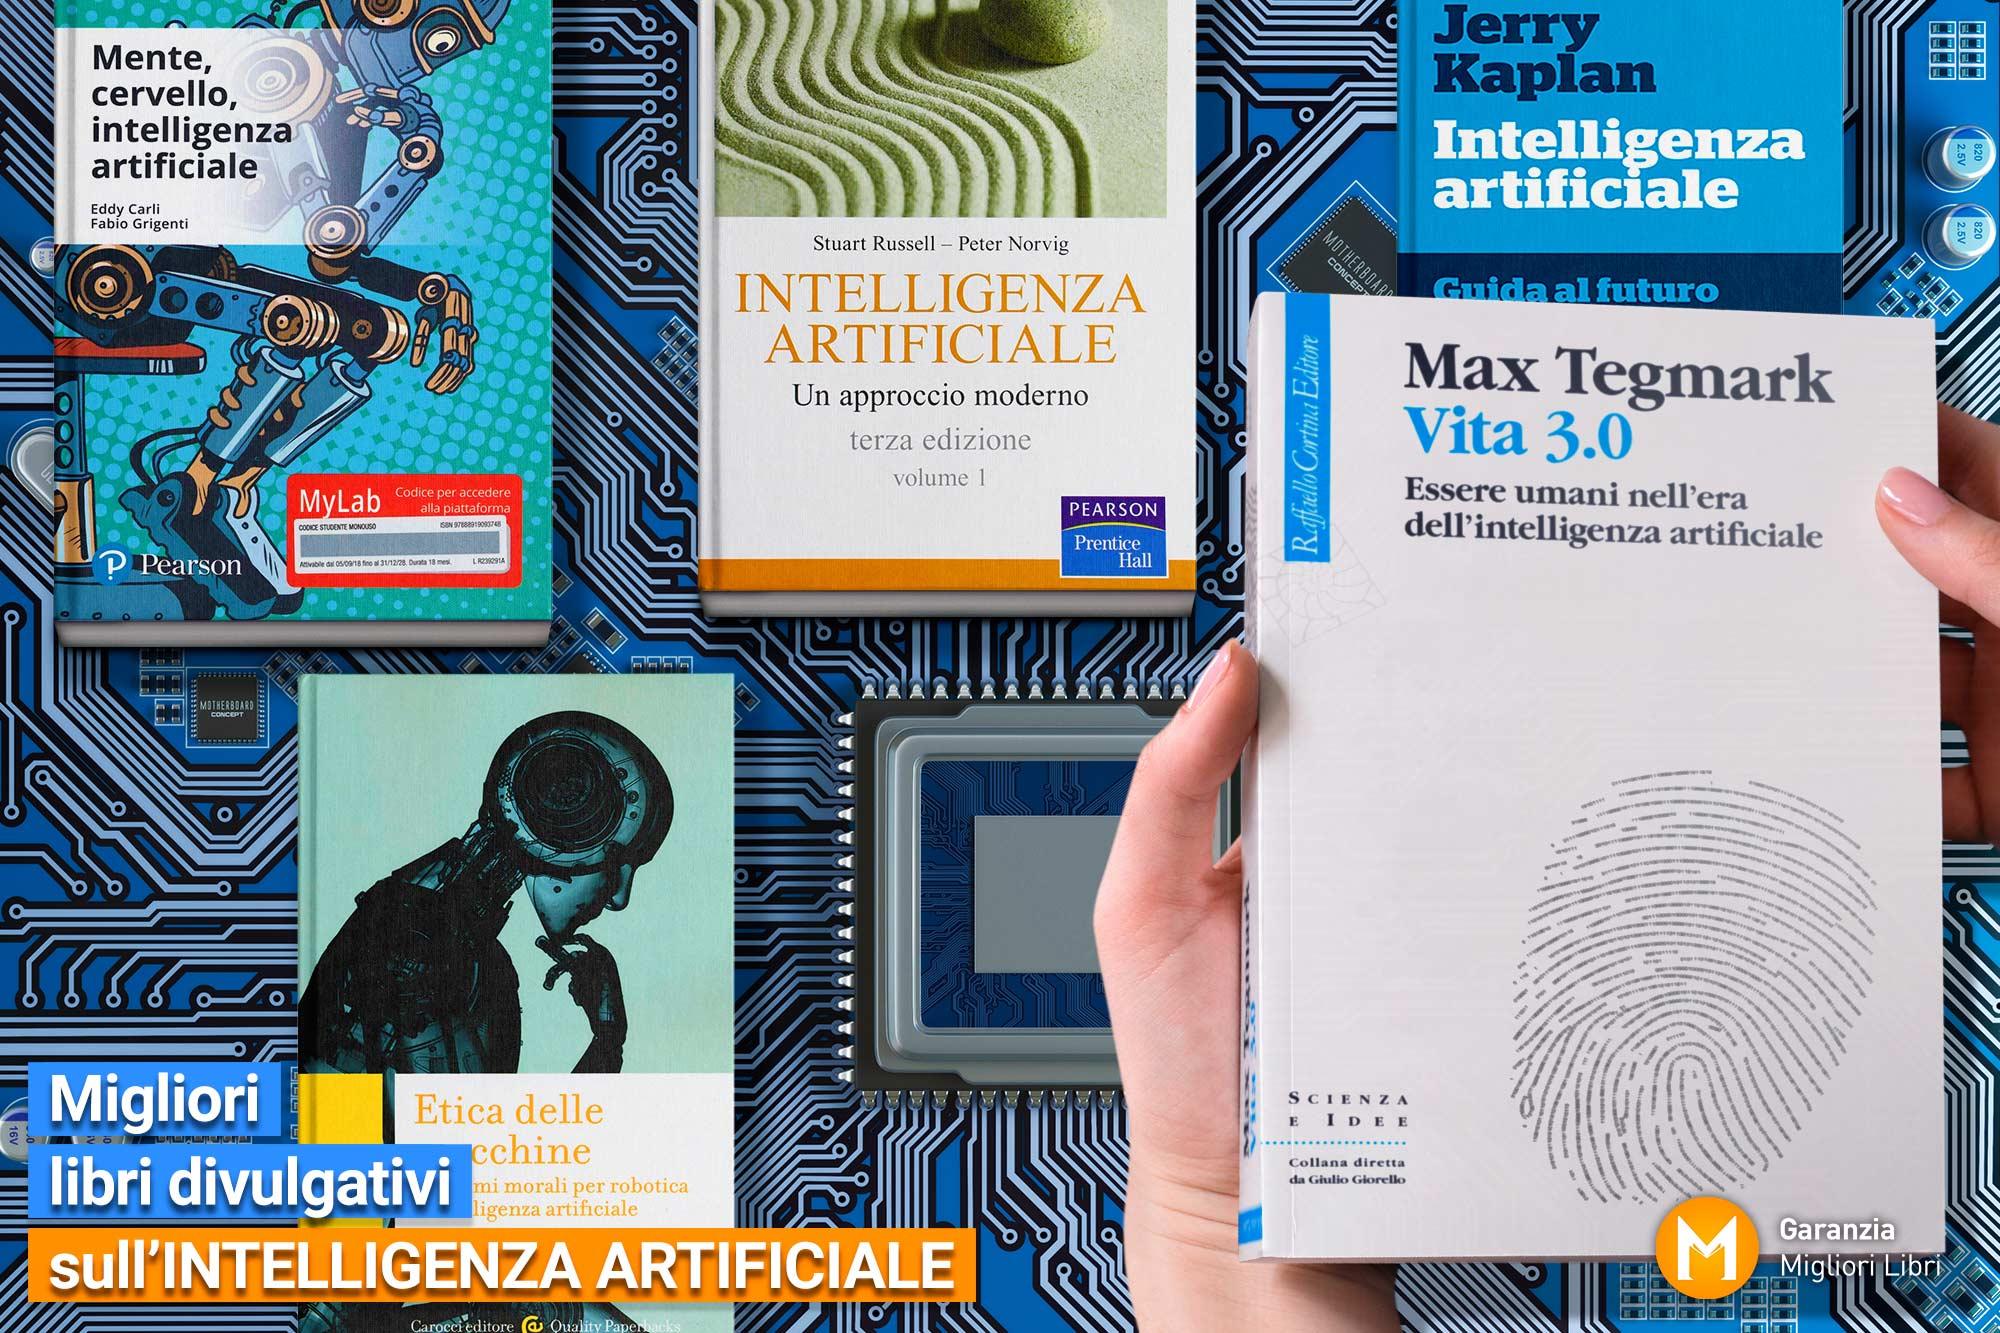 libri-intelligenza-artificiale-divulgativi